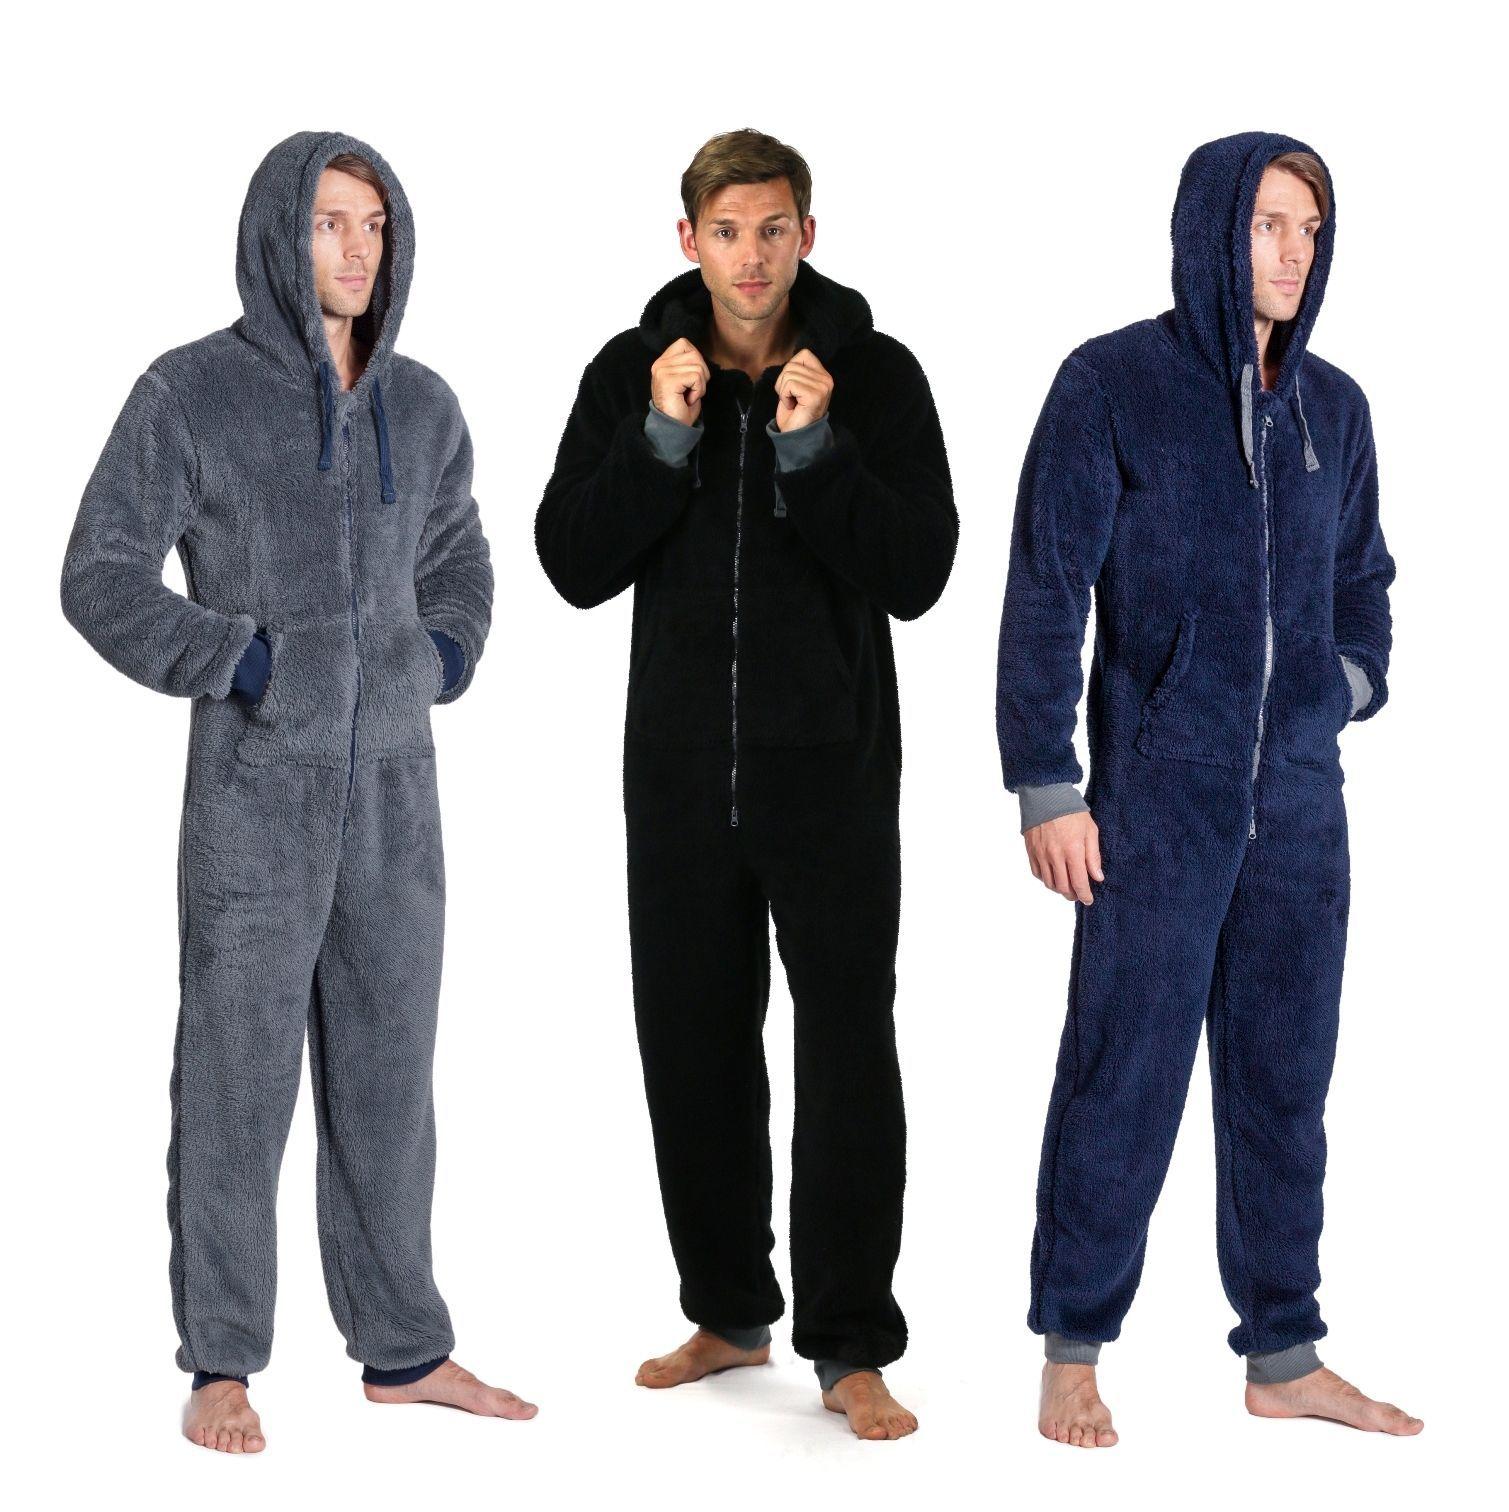 896003eb48d9 Onezee Mens Onesie Snuggle Fleece Super Plain Colour Soft Hooded Warm  Nightwear